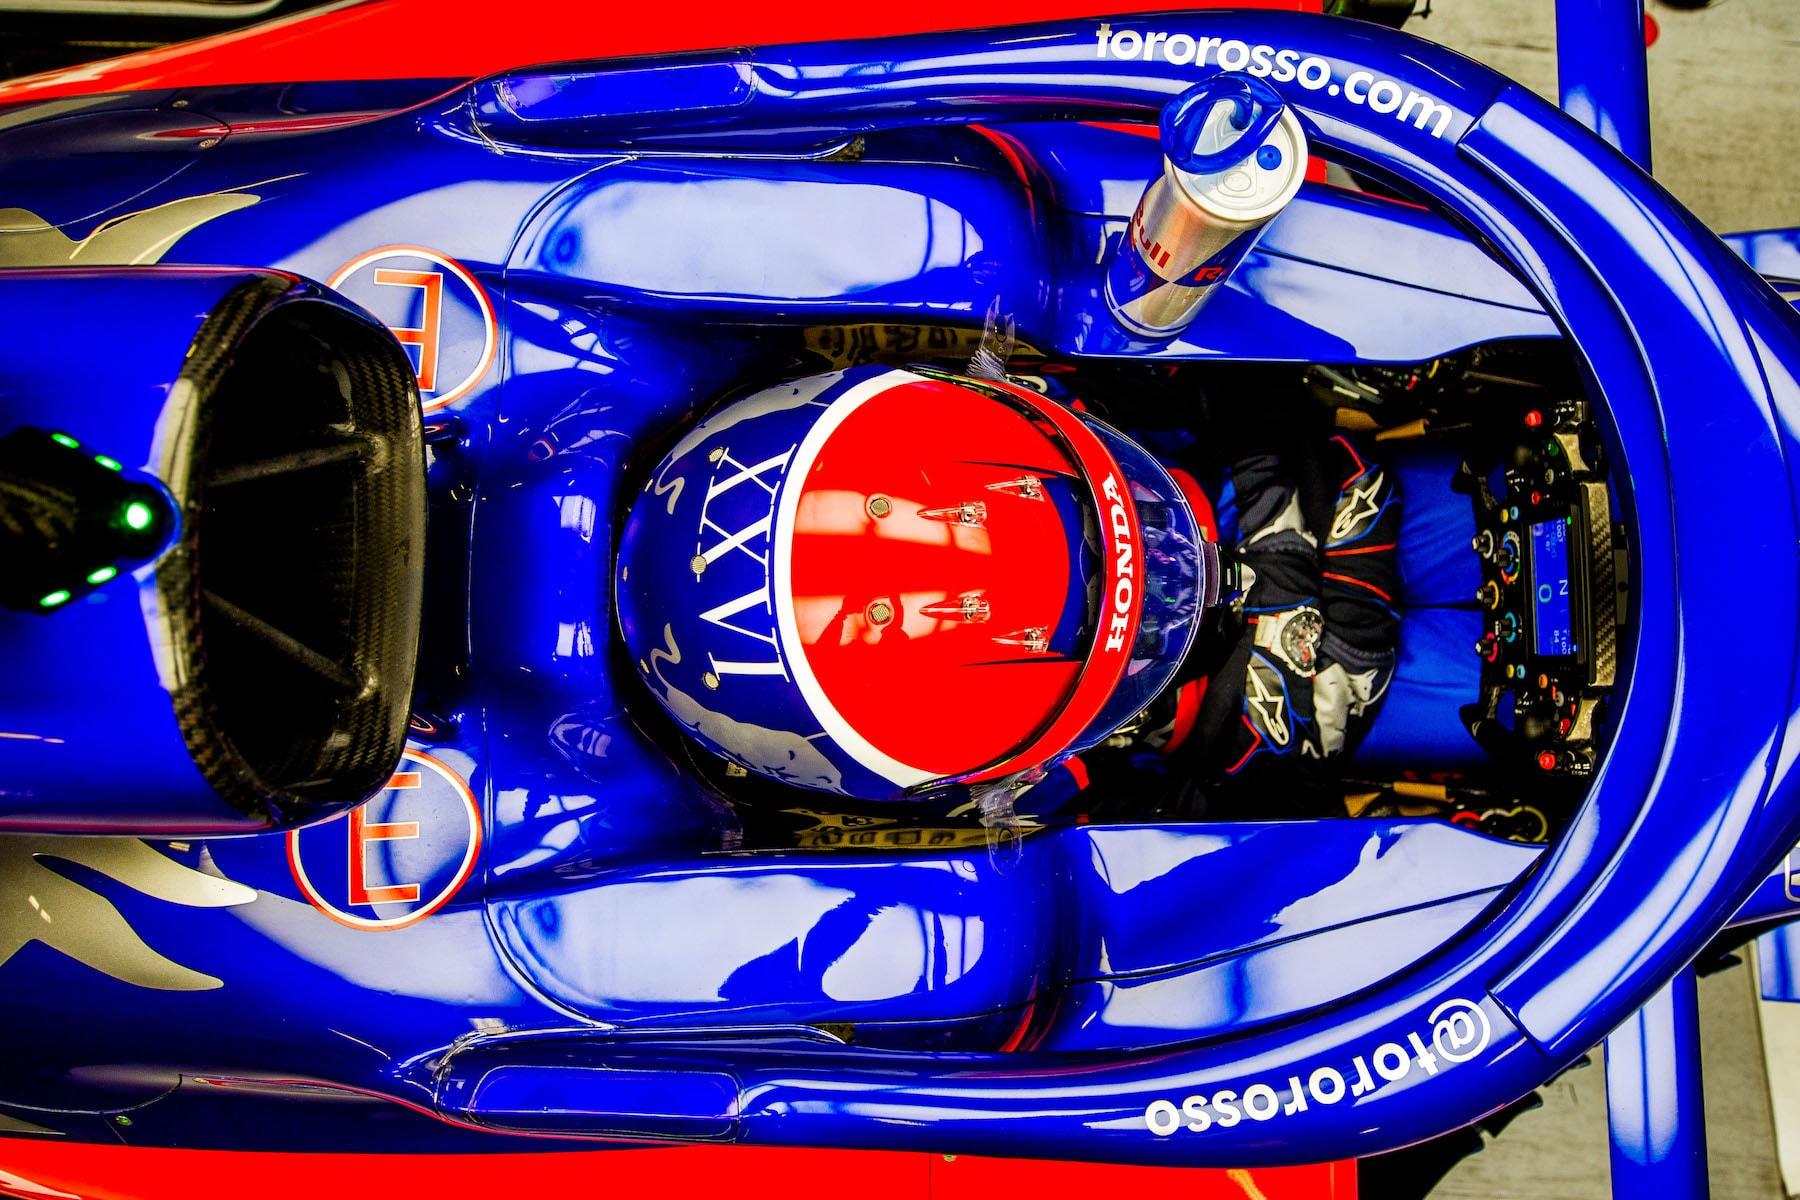 2019 Daniil Kvyat   Toro Rosso STR14   2019 Barcelona T1 D3 1 copy.jpg